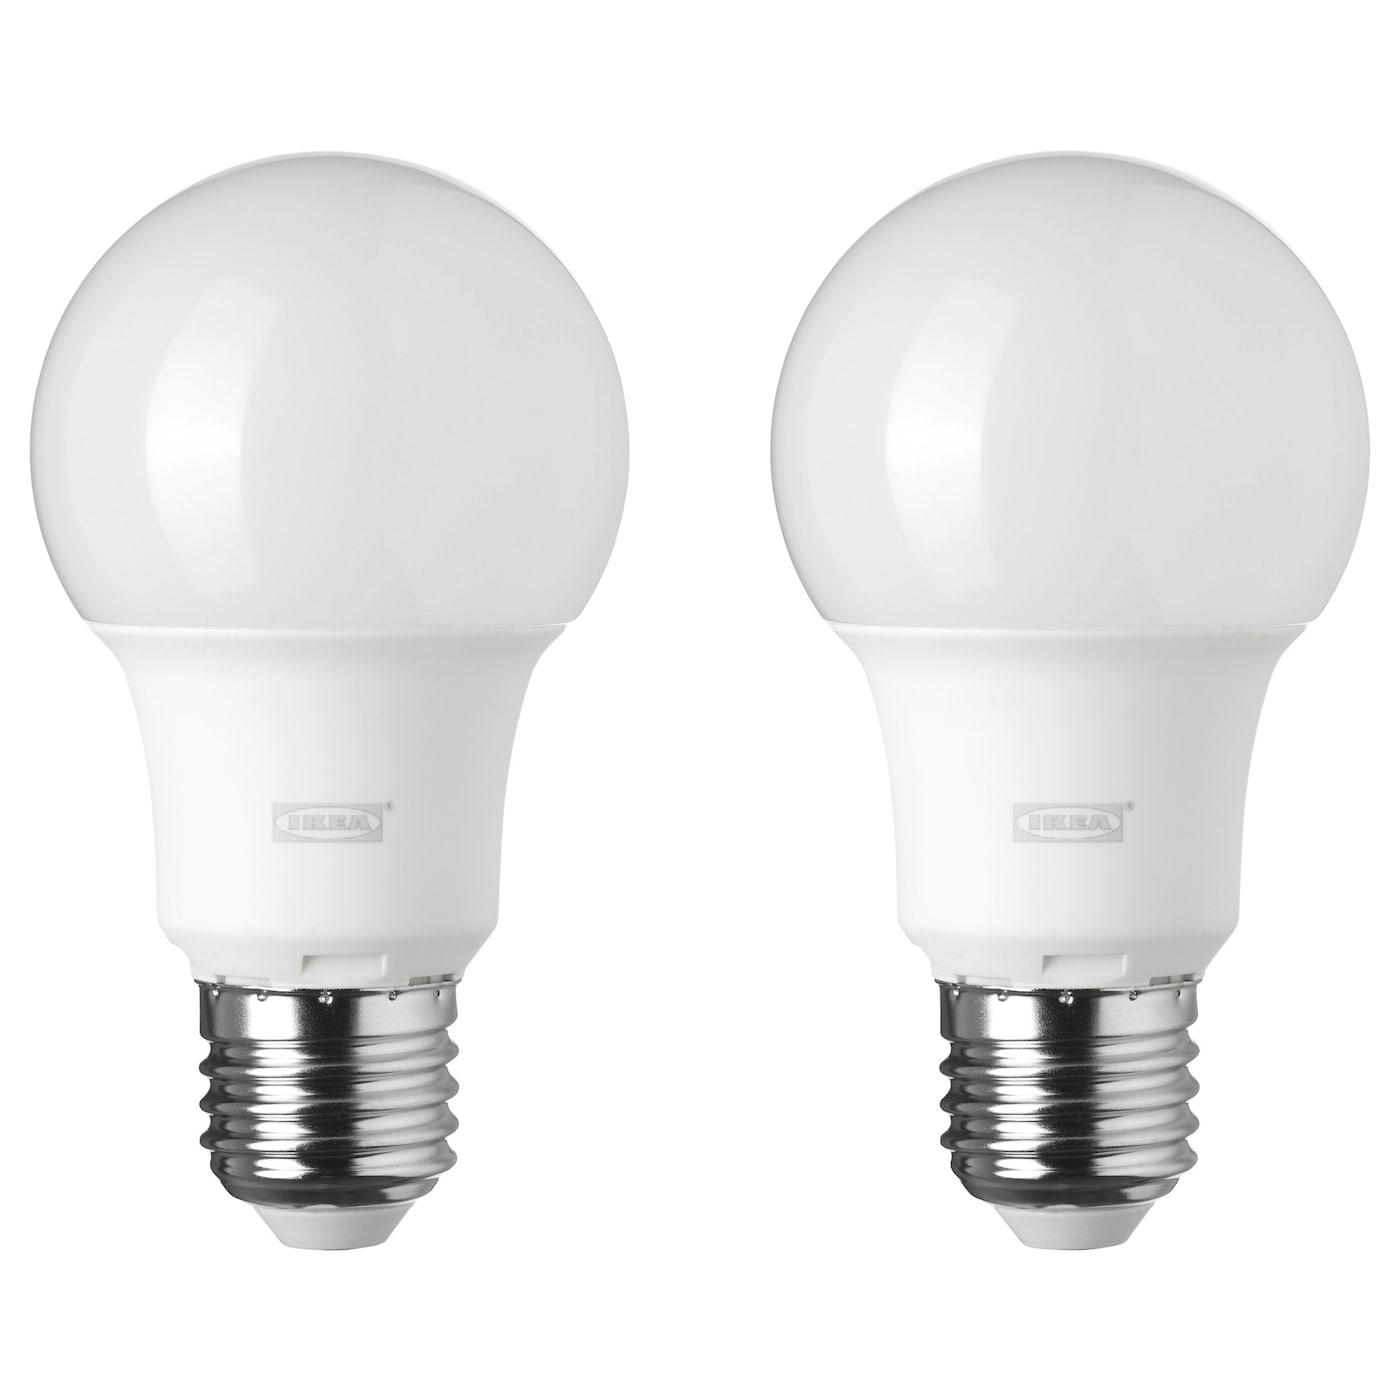 ryet-led-bulb-e27-600-lumen-globe-opal-white__0535355_pe649410_s5 Wunderschöne Led Leuchtmittel E27 1000 Lumen Dekorationen